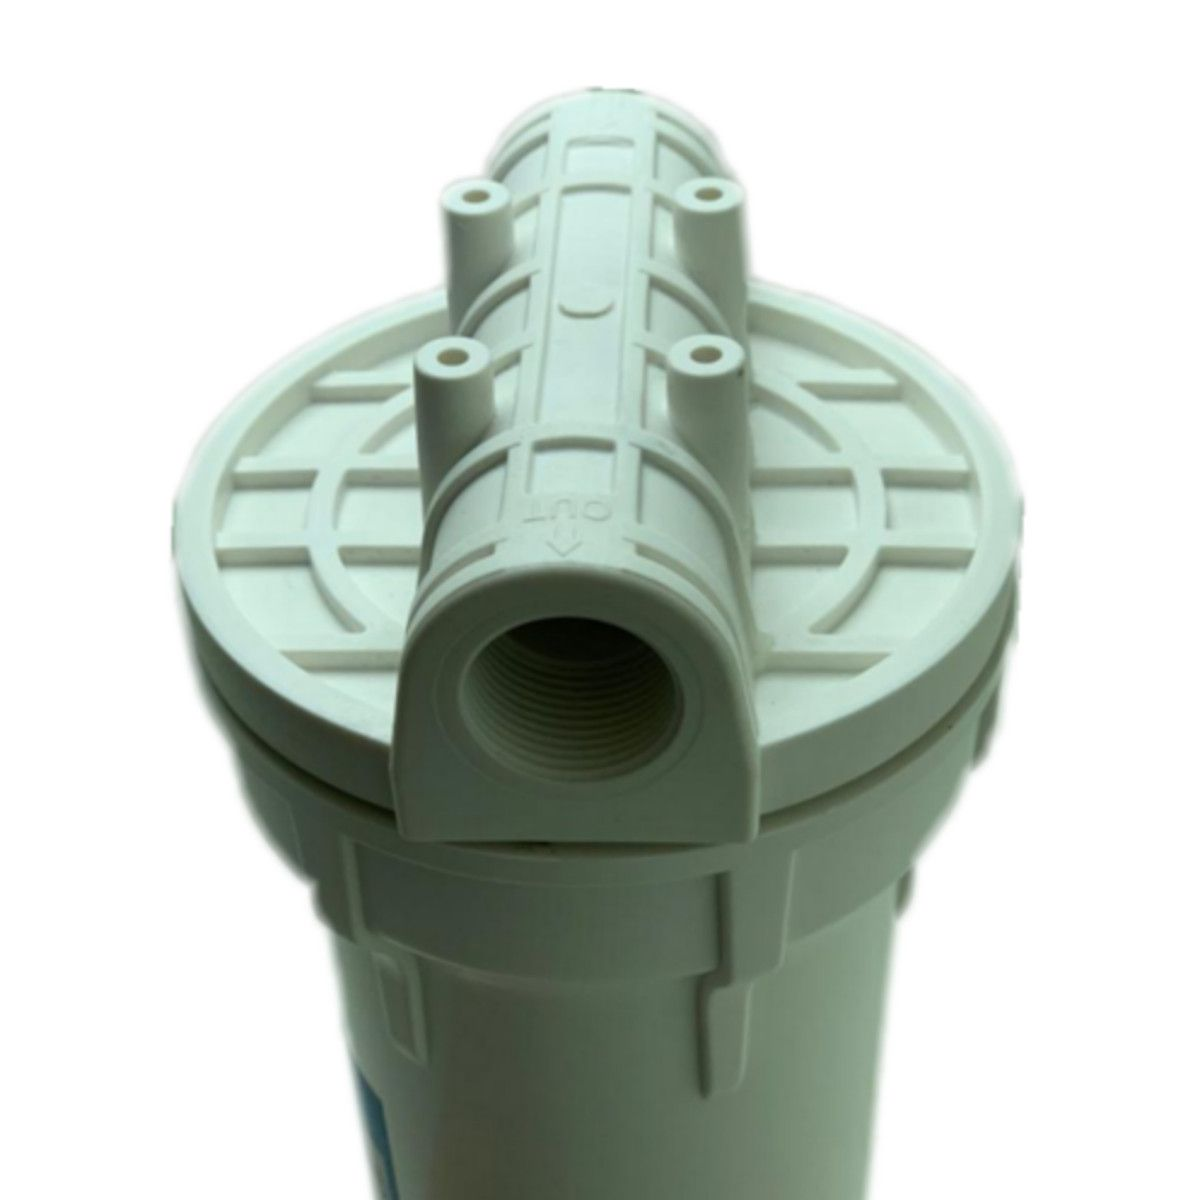 Filtro Água P/ Caixa Dágua 7 Ou Cavalete De Entrada + Refil